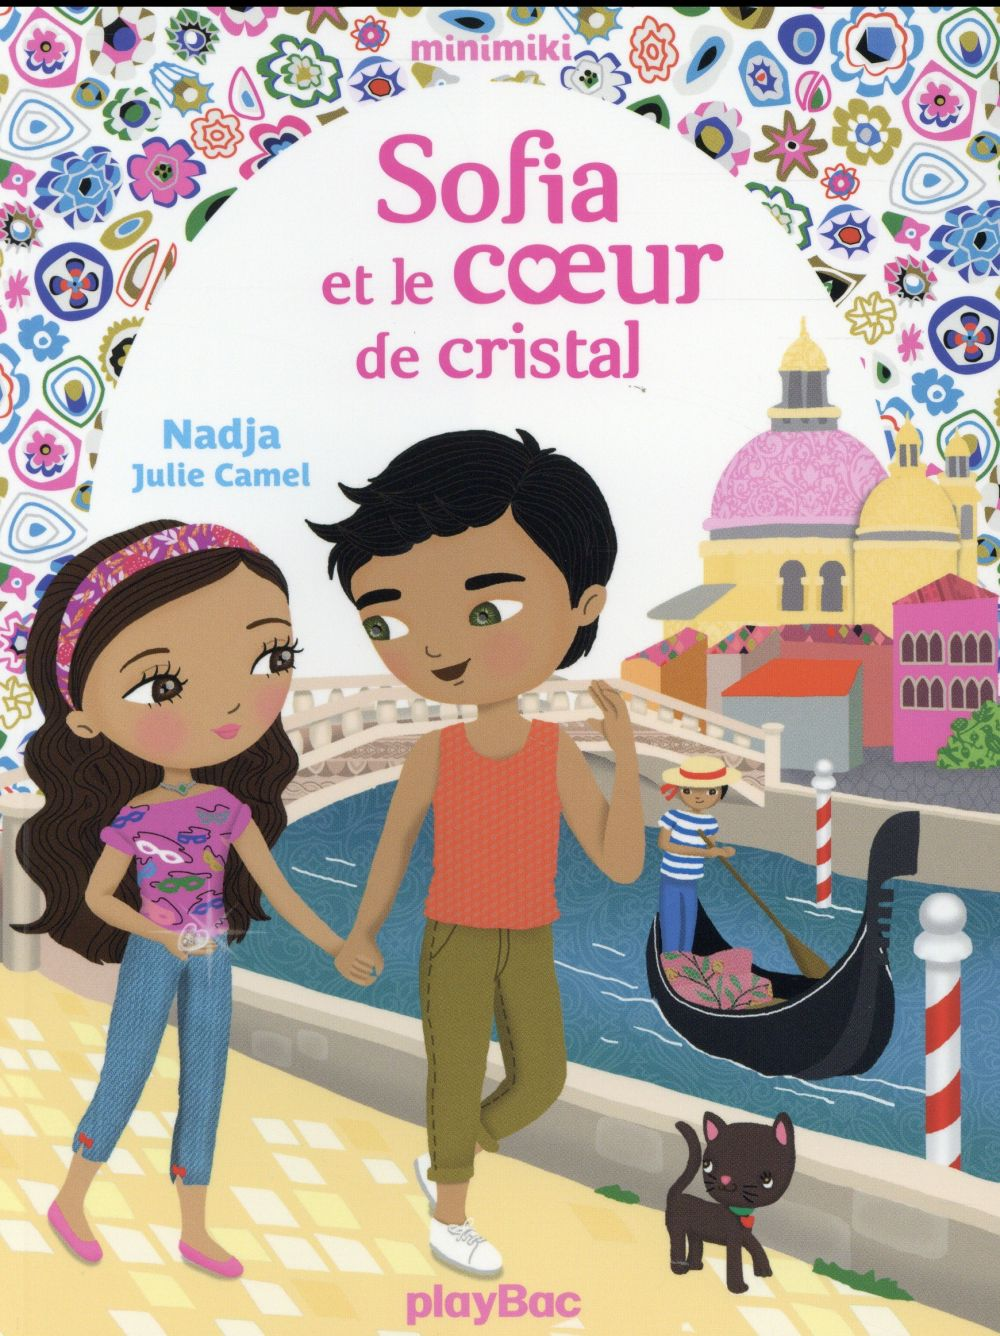 MINIMIKI - SOFIA ET LE COEUR DE CRISTAL - TOME 14 Nadja Play Bac